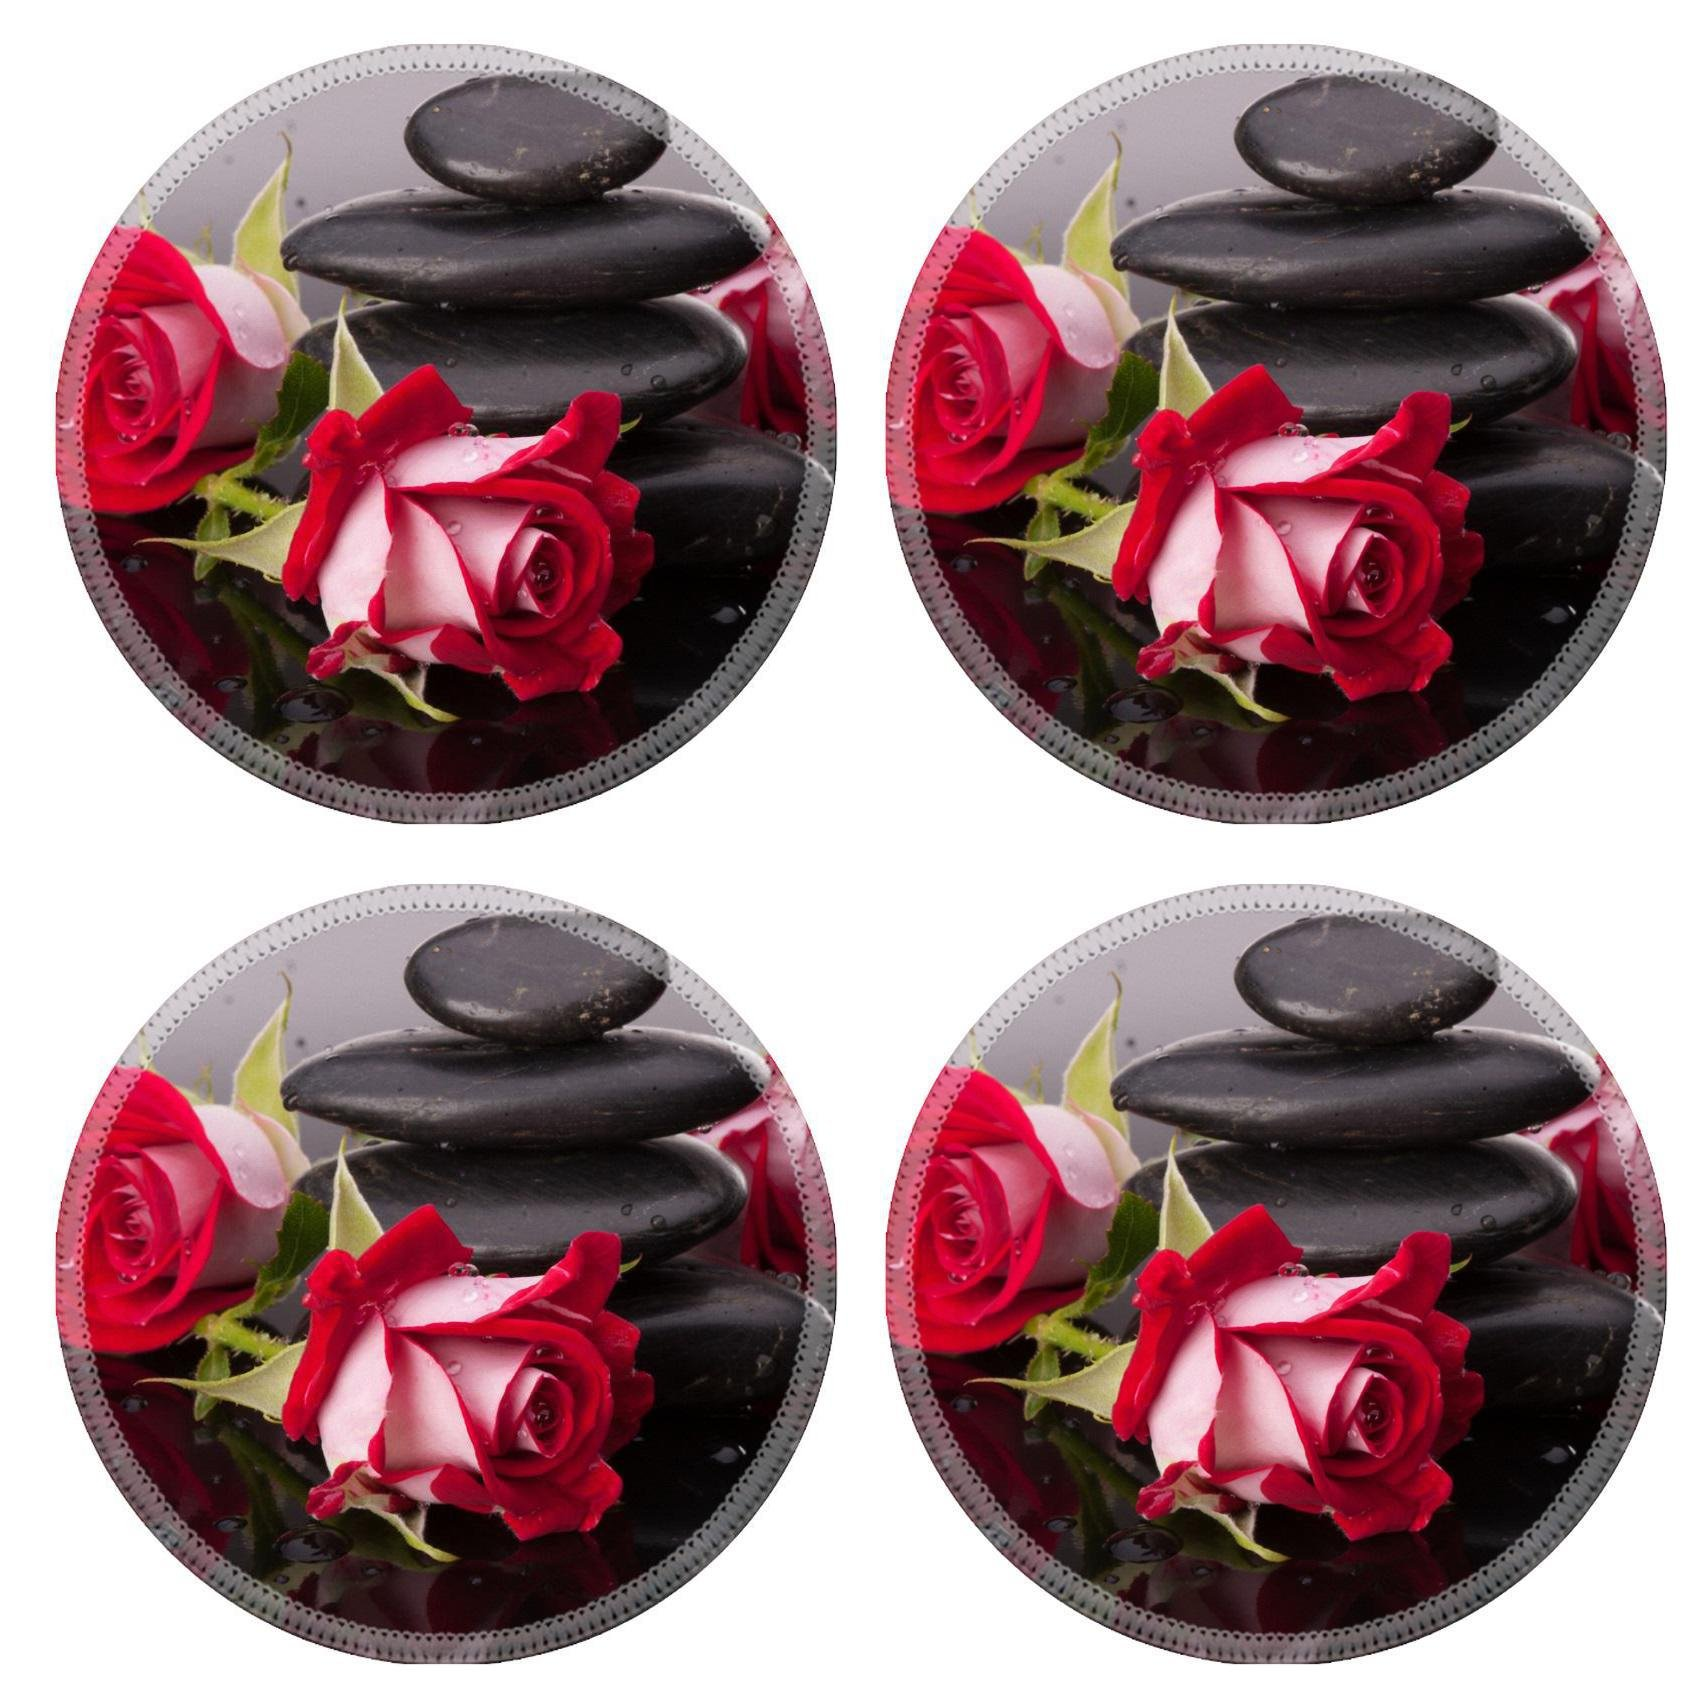 MSD Round Coasters Non-Slip Natural Rubber Desk Coasters design 24288563 Spa stone and rose flowers still life Healthcare concept